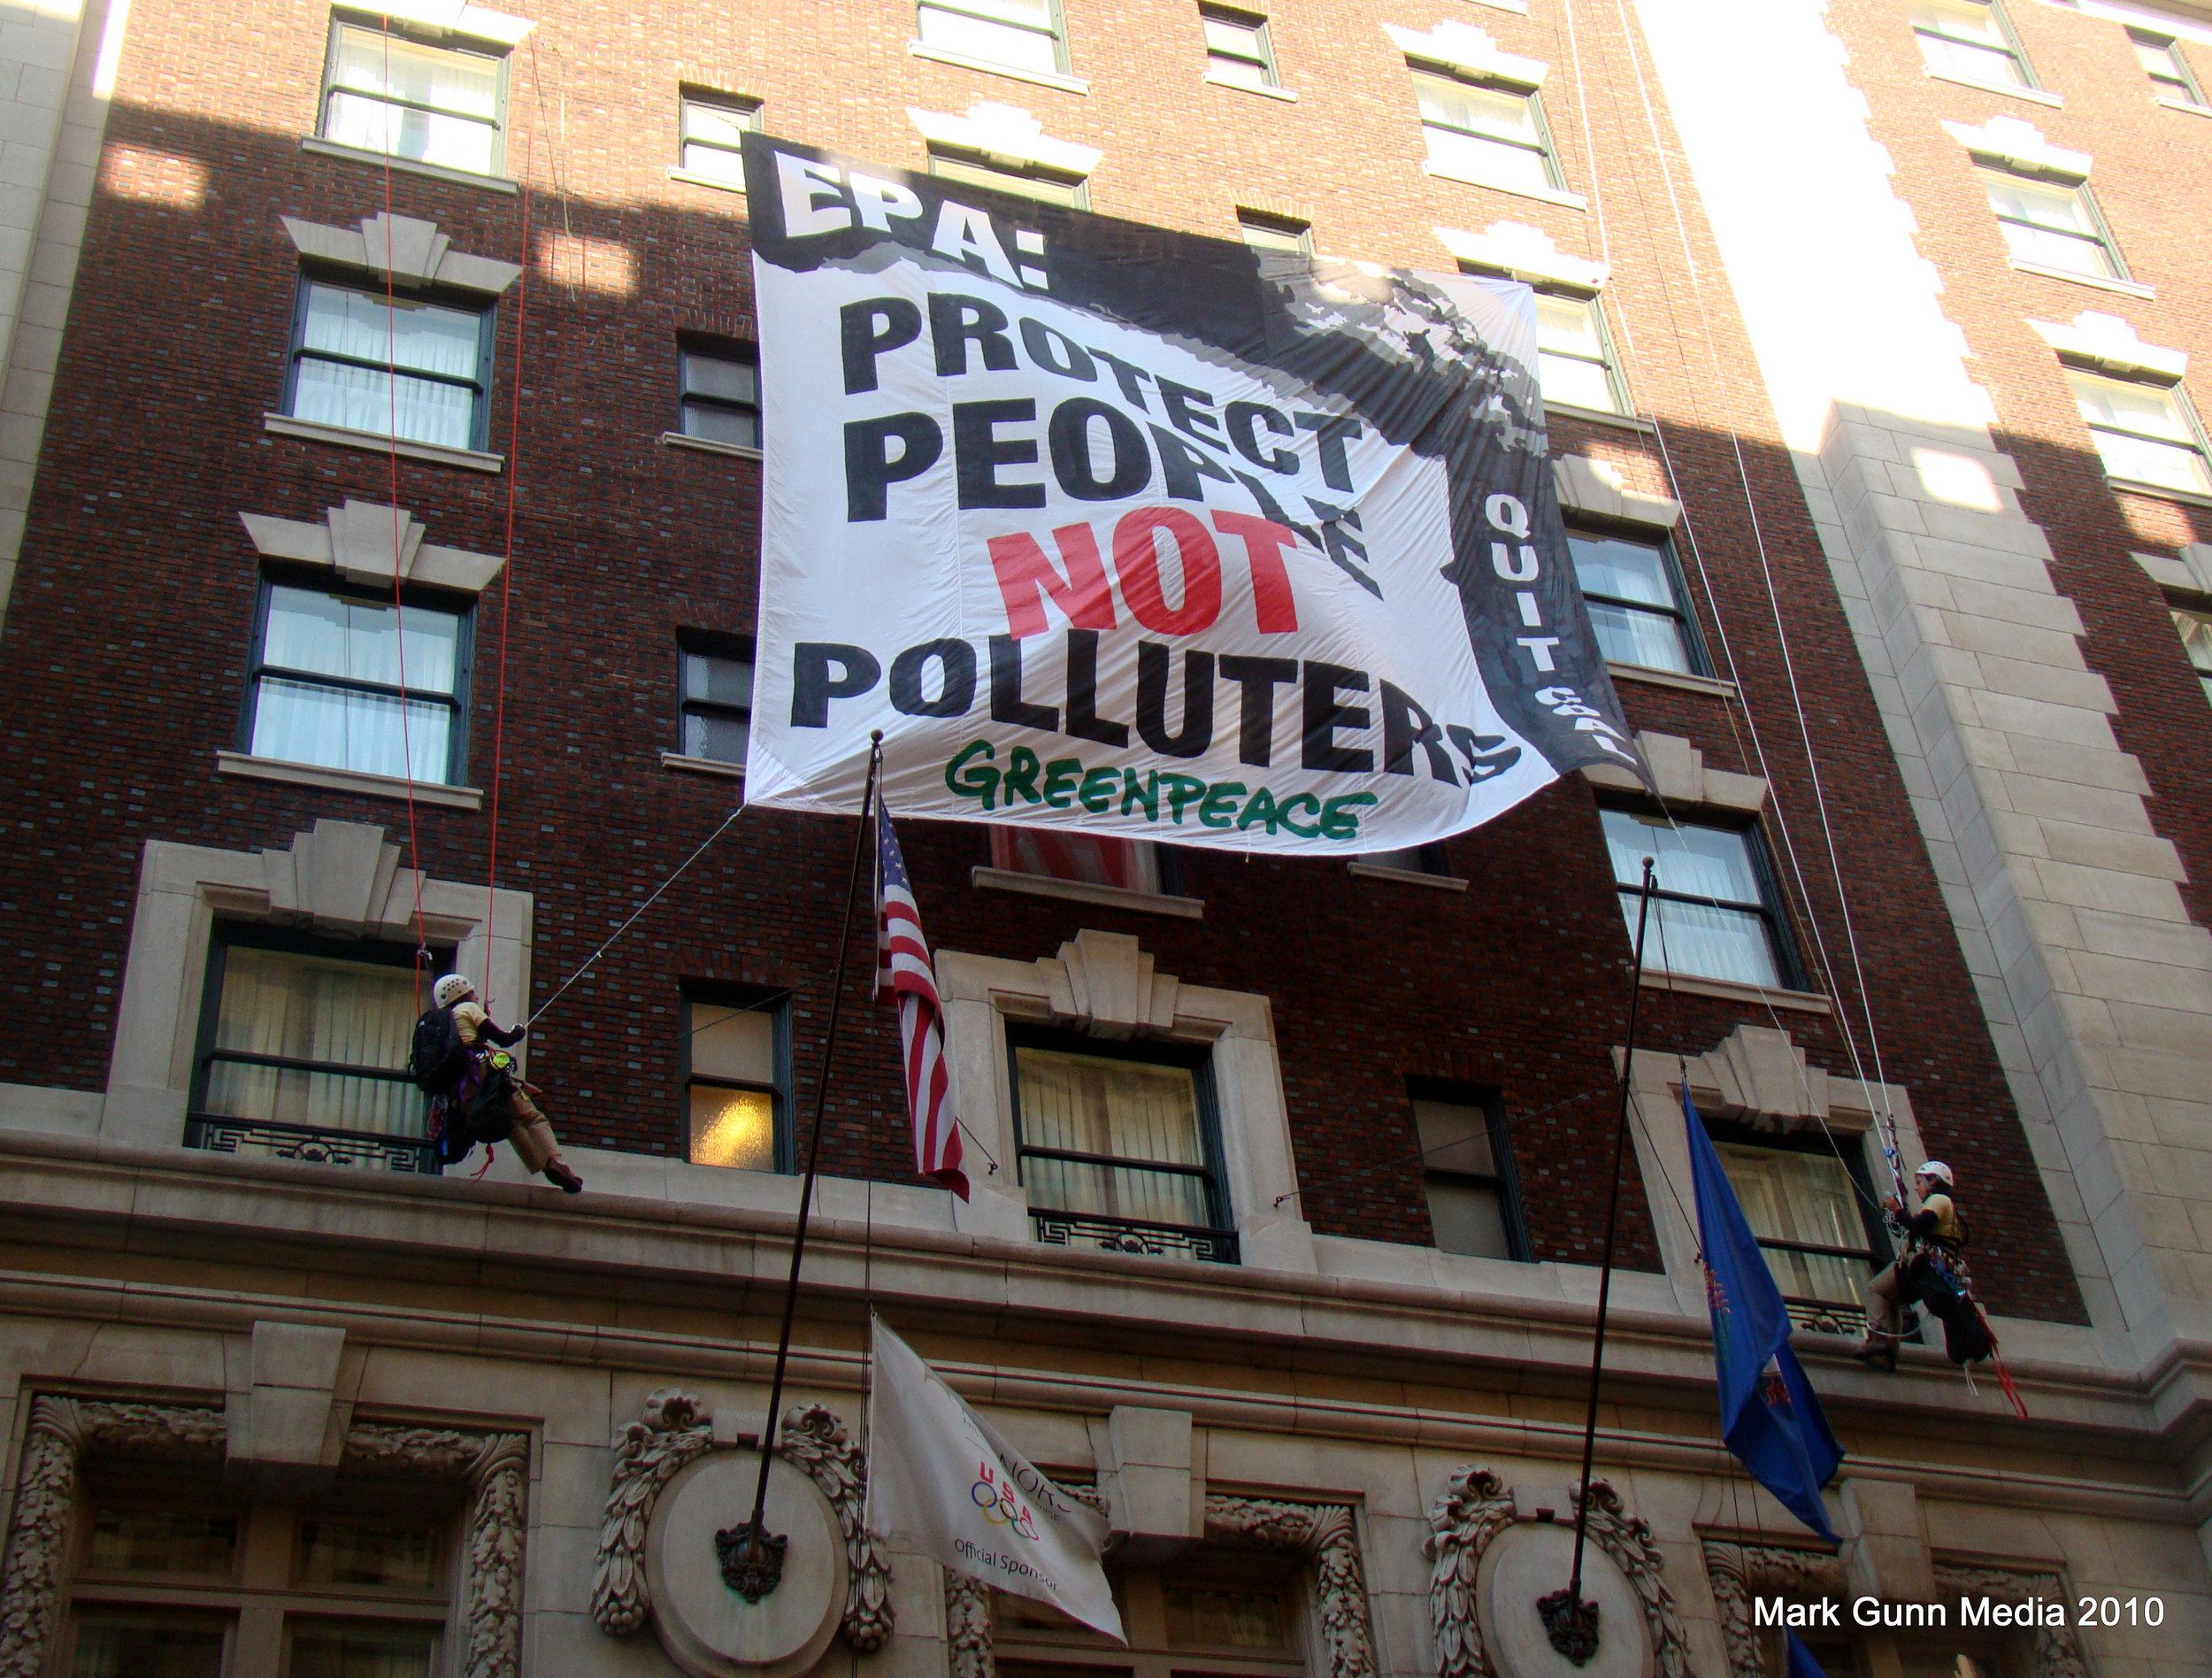 2 Greenpeace.JPG